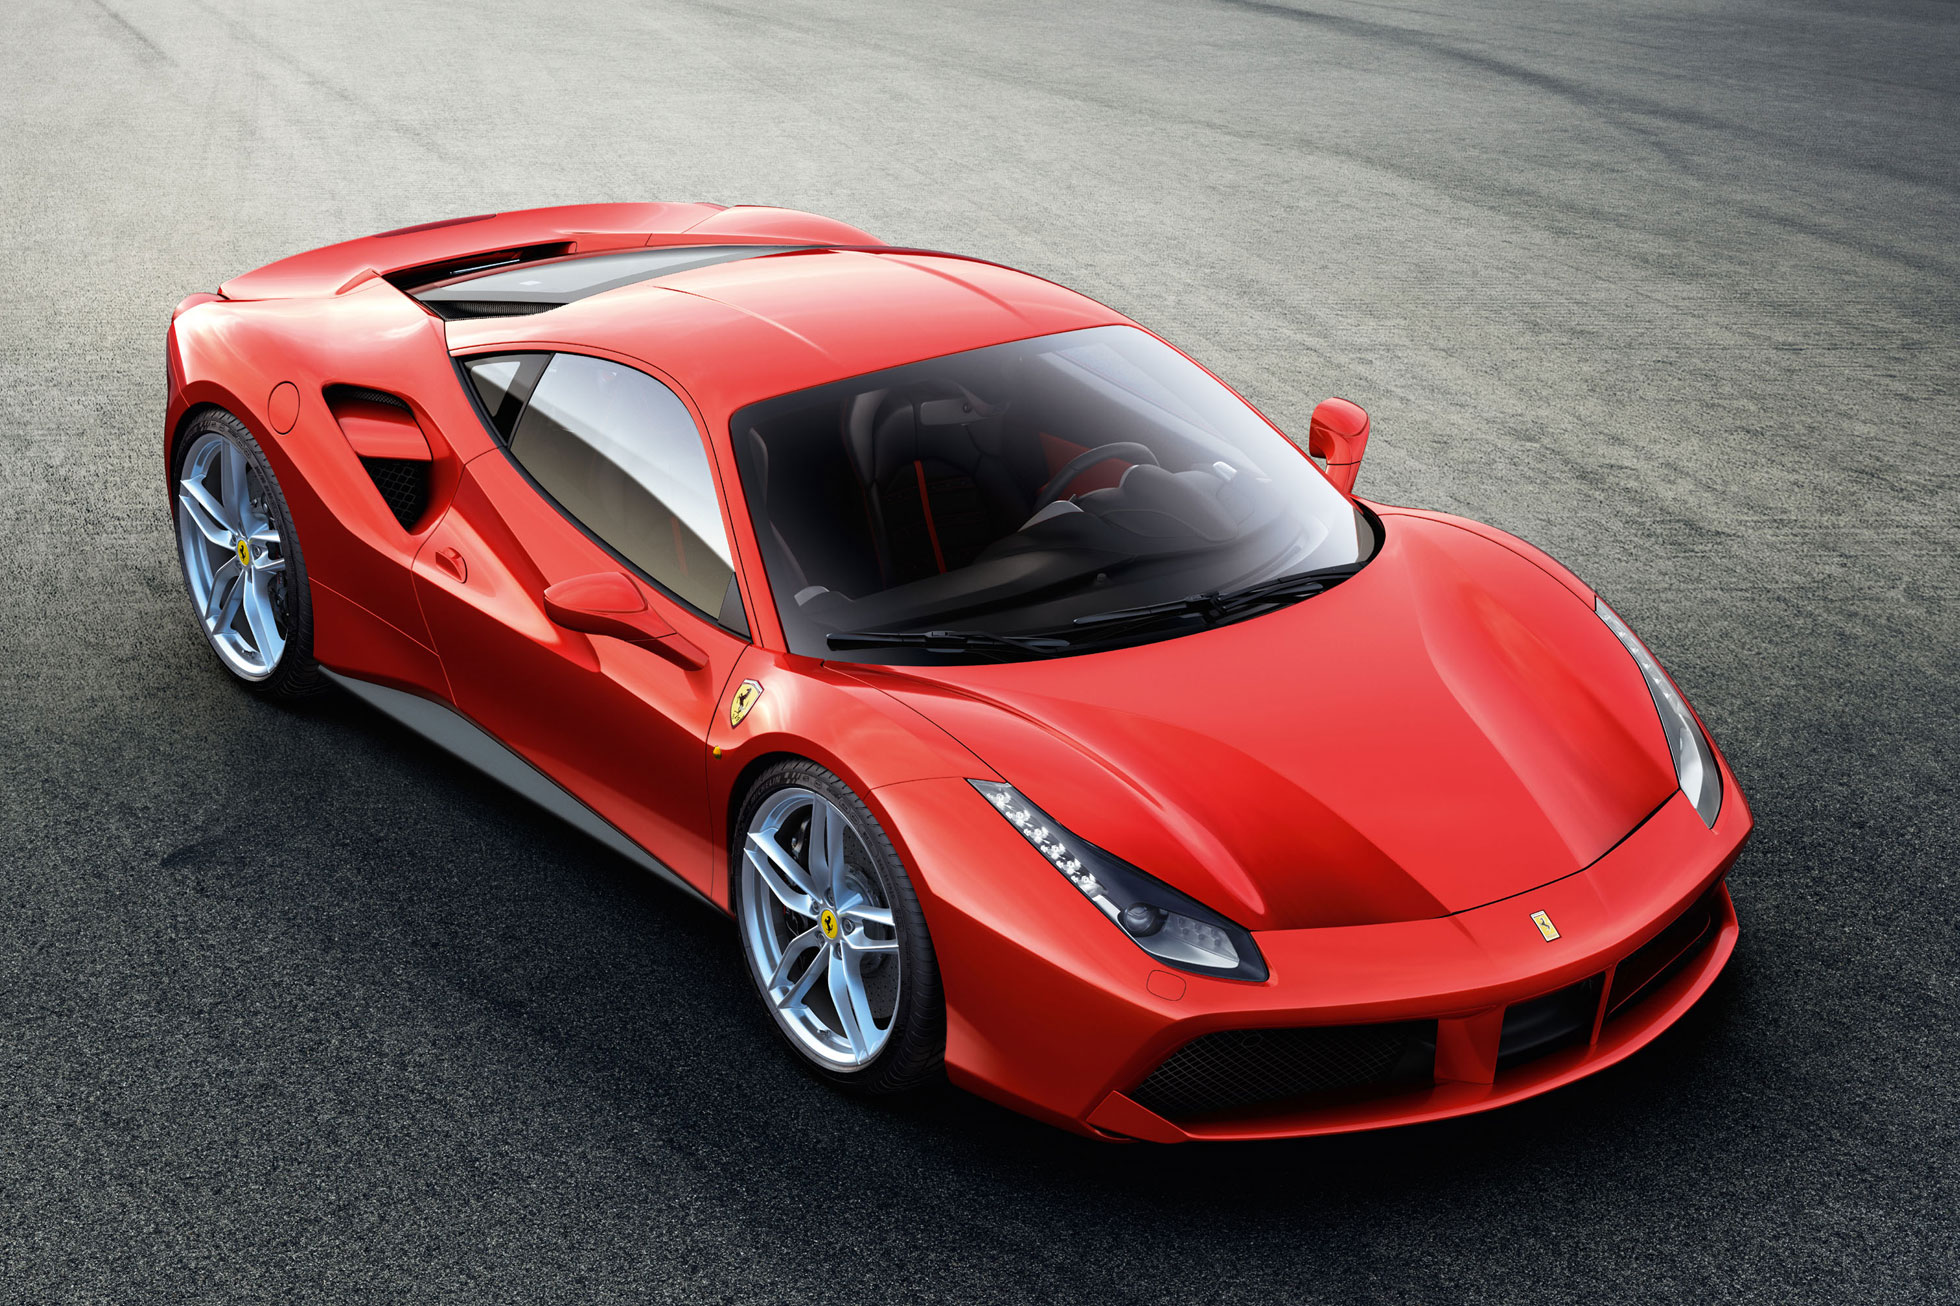 Ferrari North America issues stop-sale order over Ferrari 488 GTB fire risk